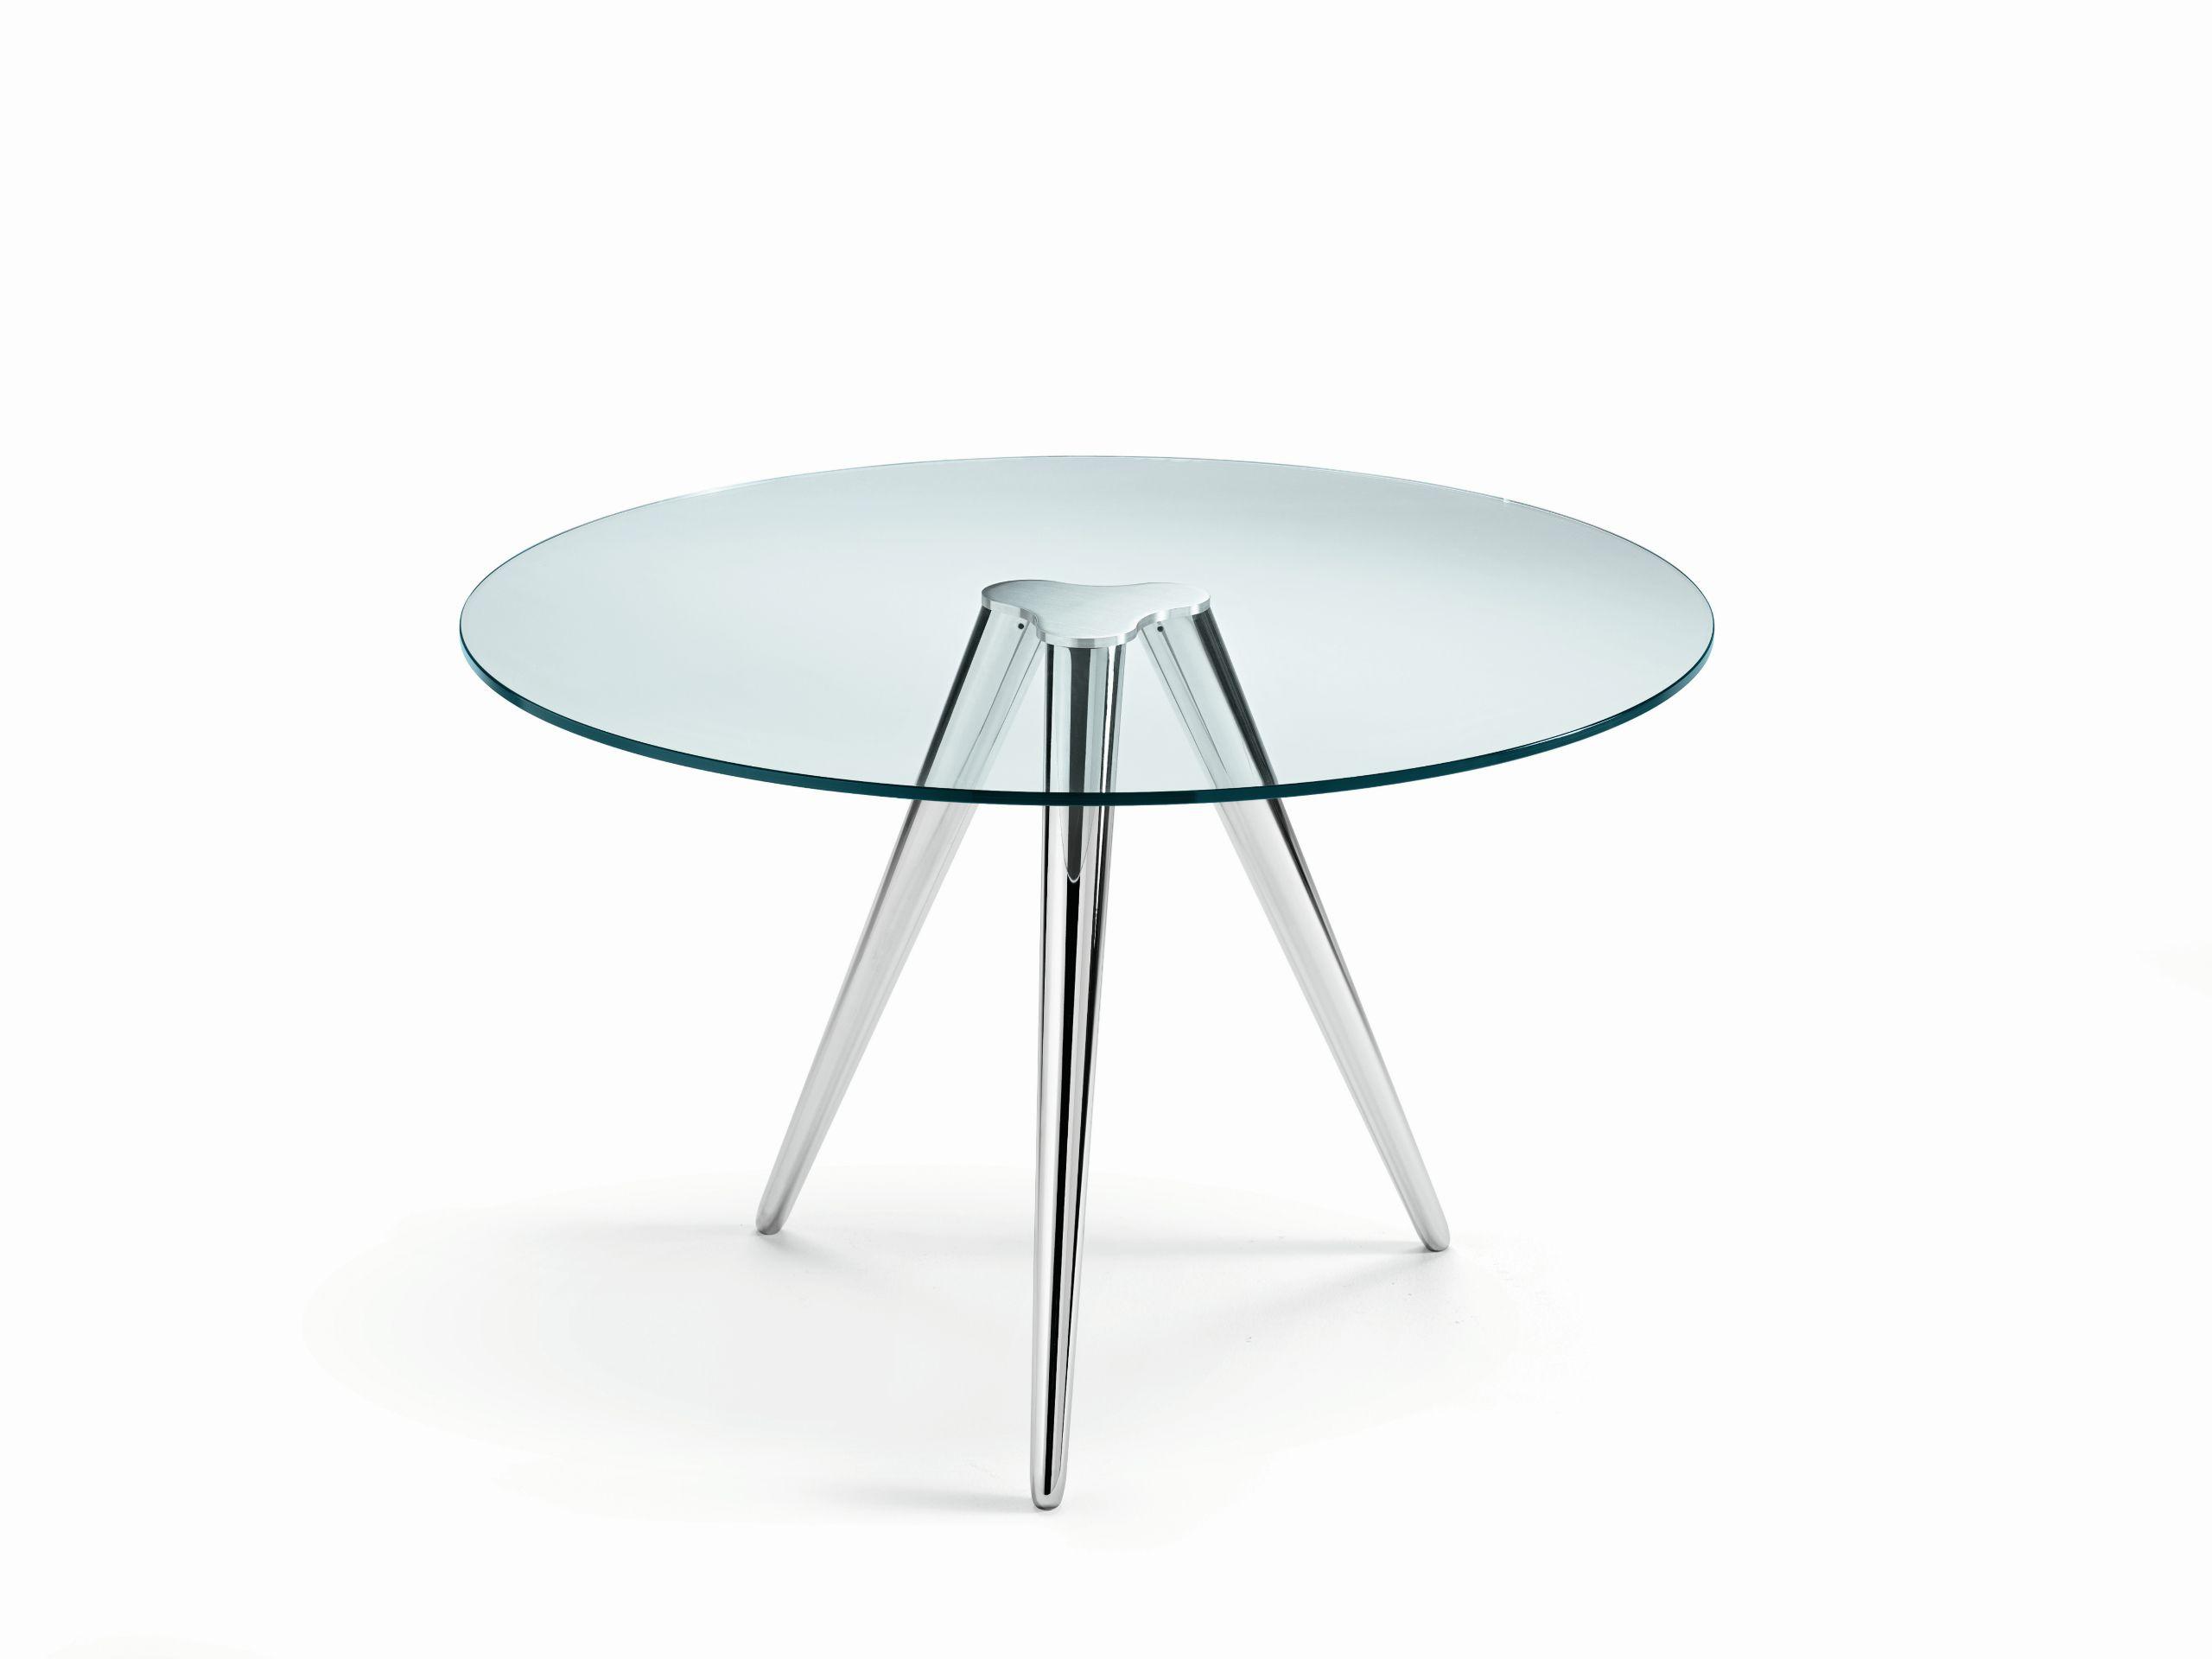 Round glass table UNITY by T.D. Tonelli Design | design Karim Rashid